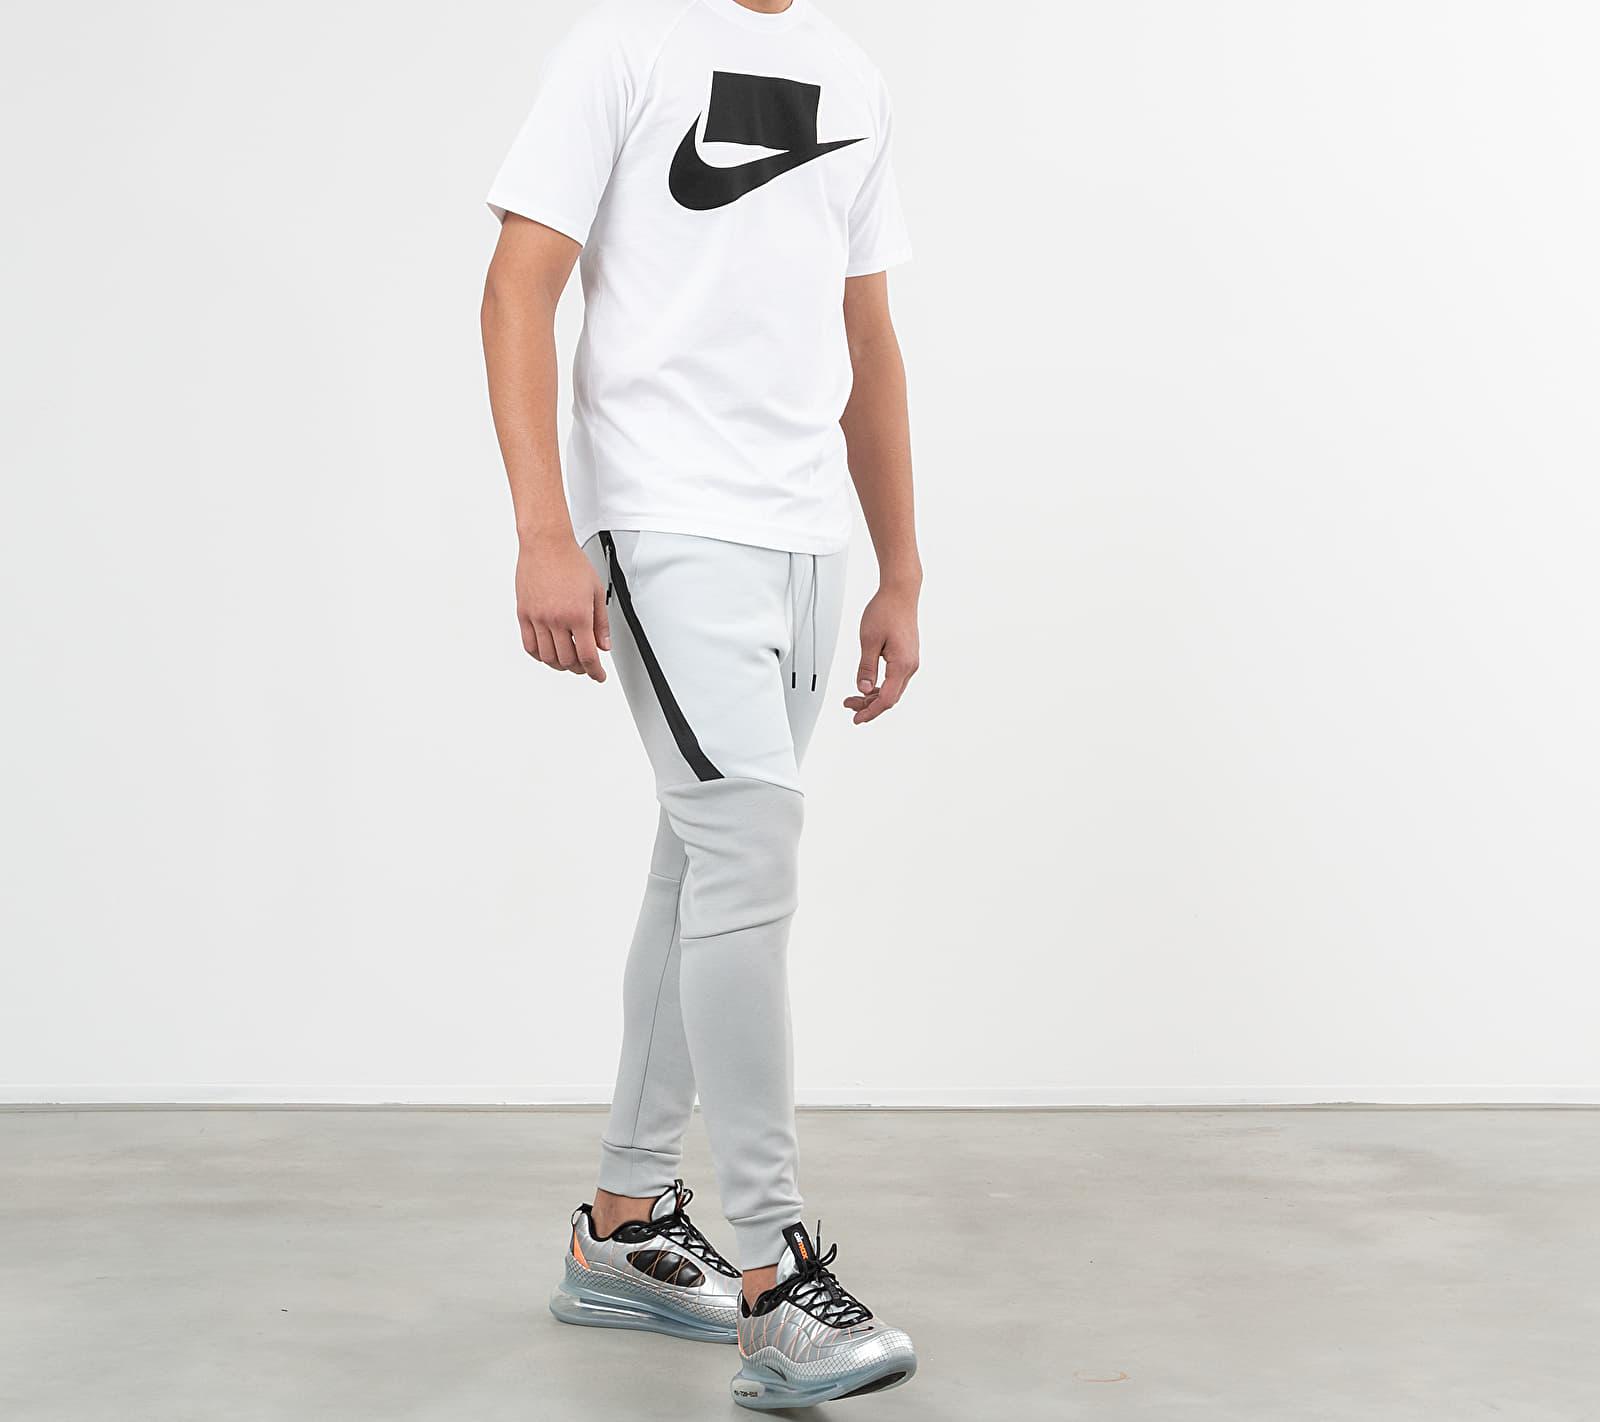 Nike Sportswear Tech Fleece Jogger Pants Light Smoke Grey Pure Platinum White Gray Buy At The Price Of 85 00 In Footshop Eu Imall Com